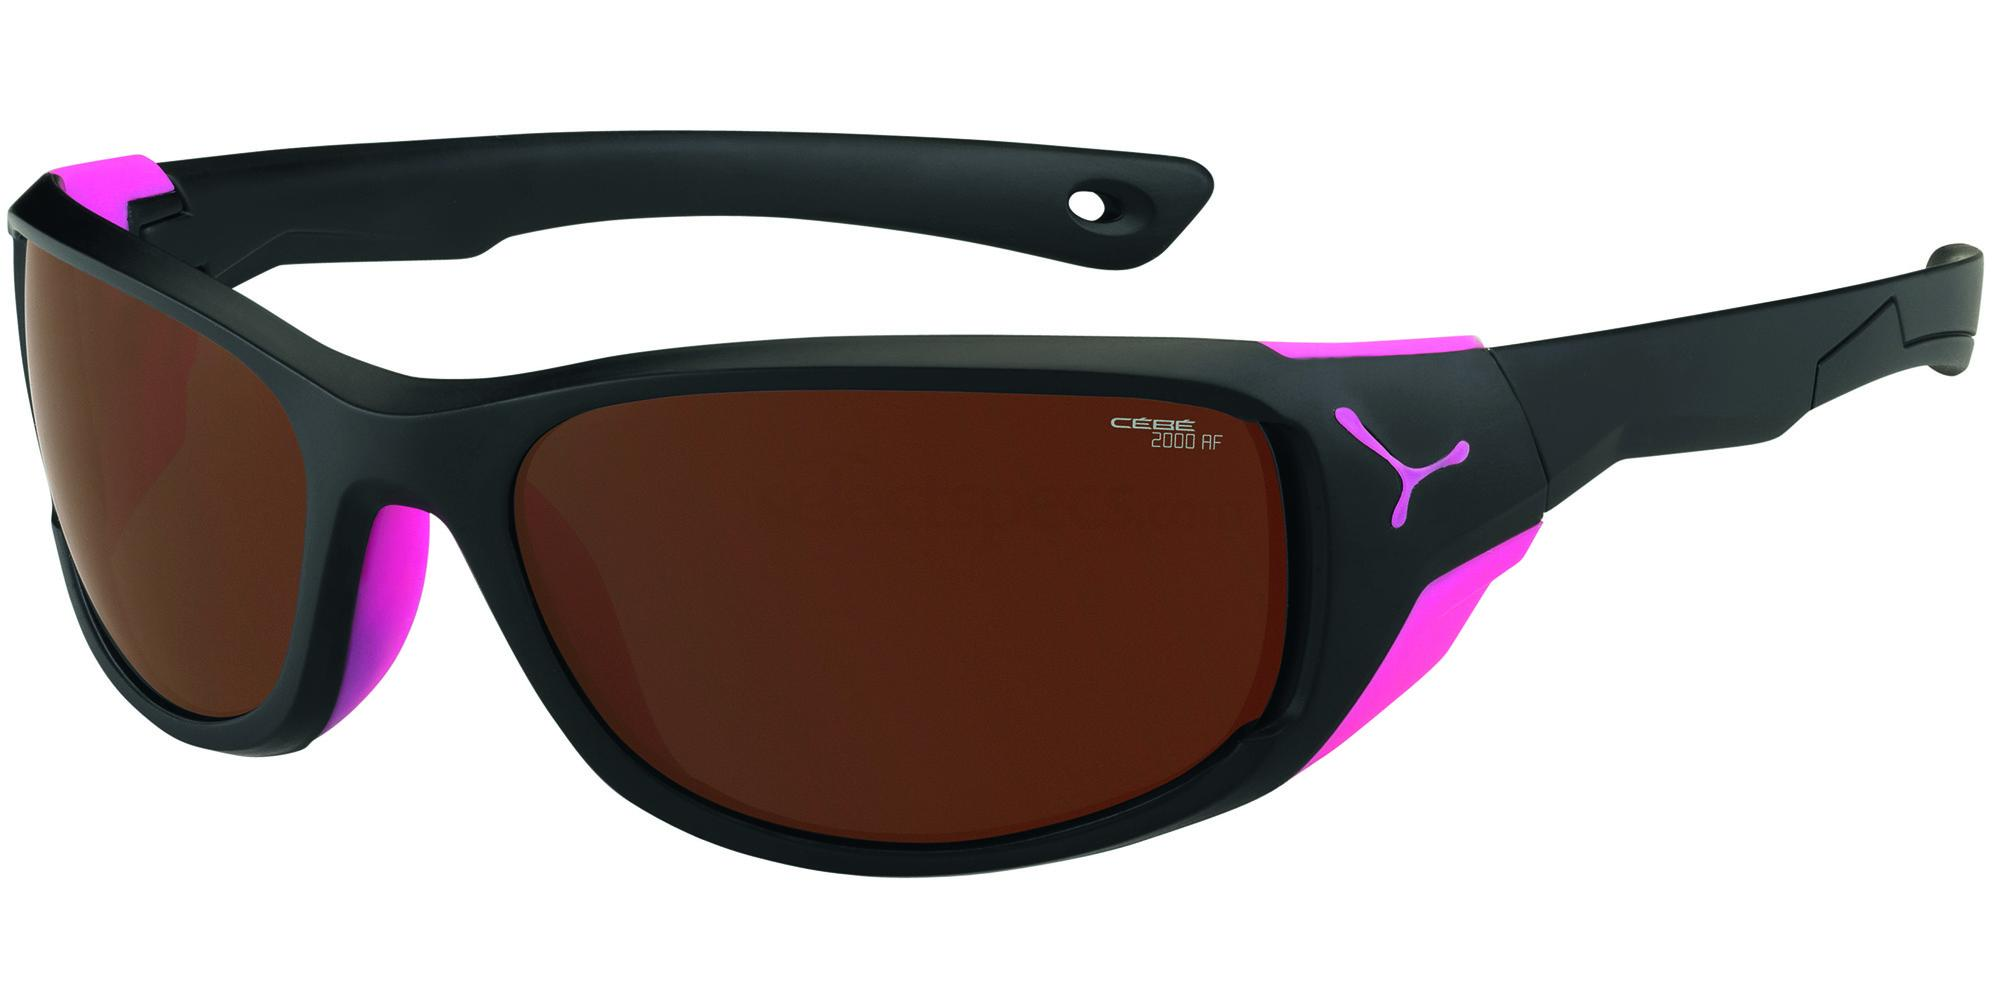 CBJOM1 Jorasses (Medium Fit) Sunglasses, Cebe